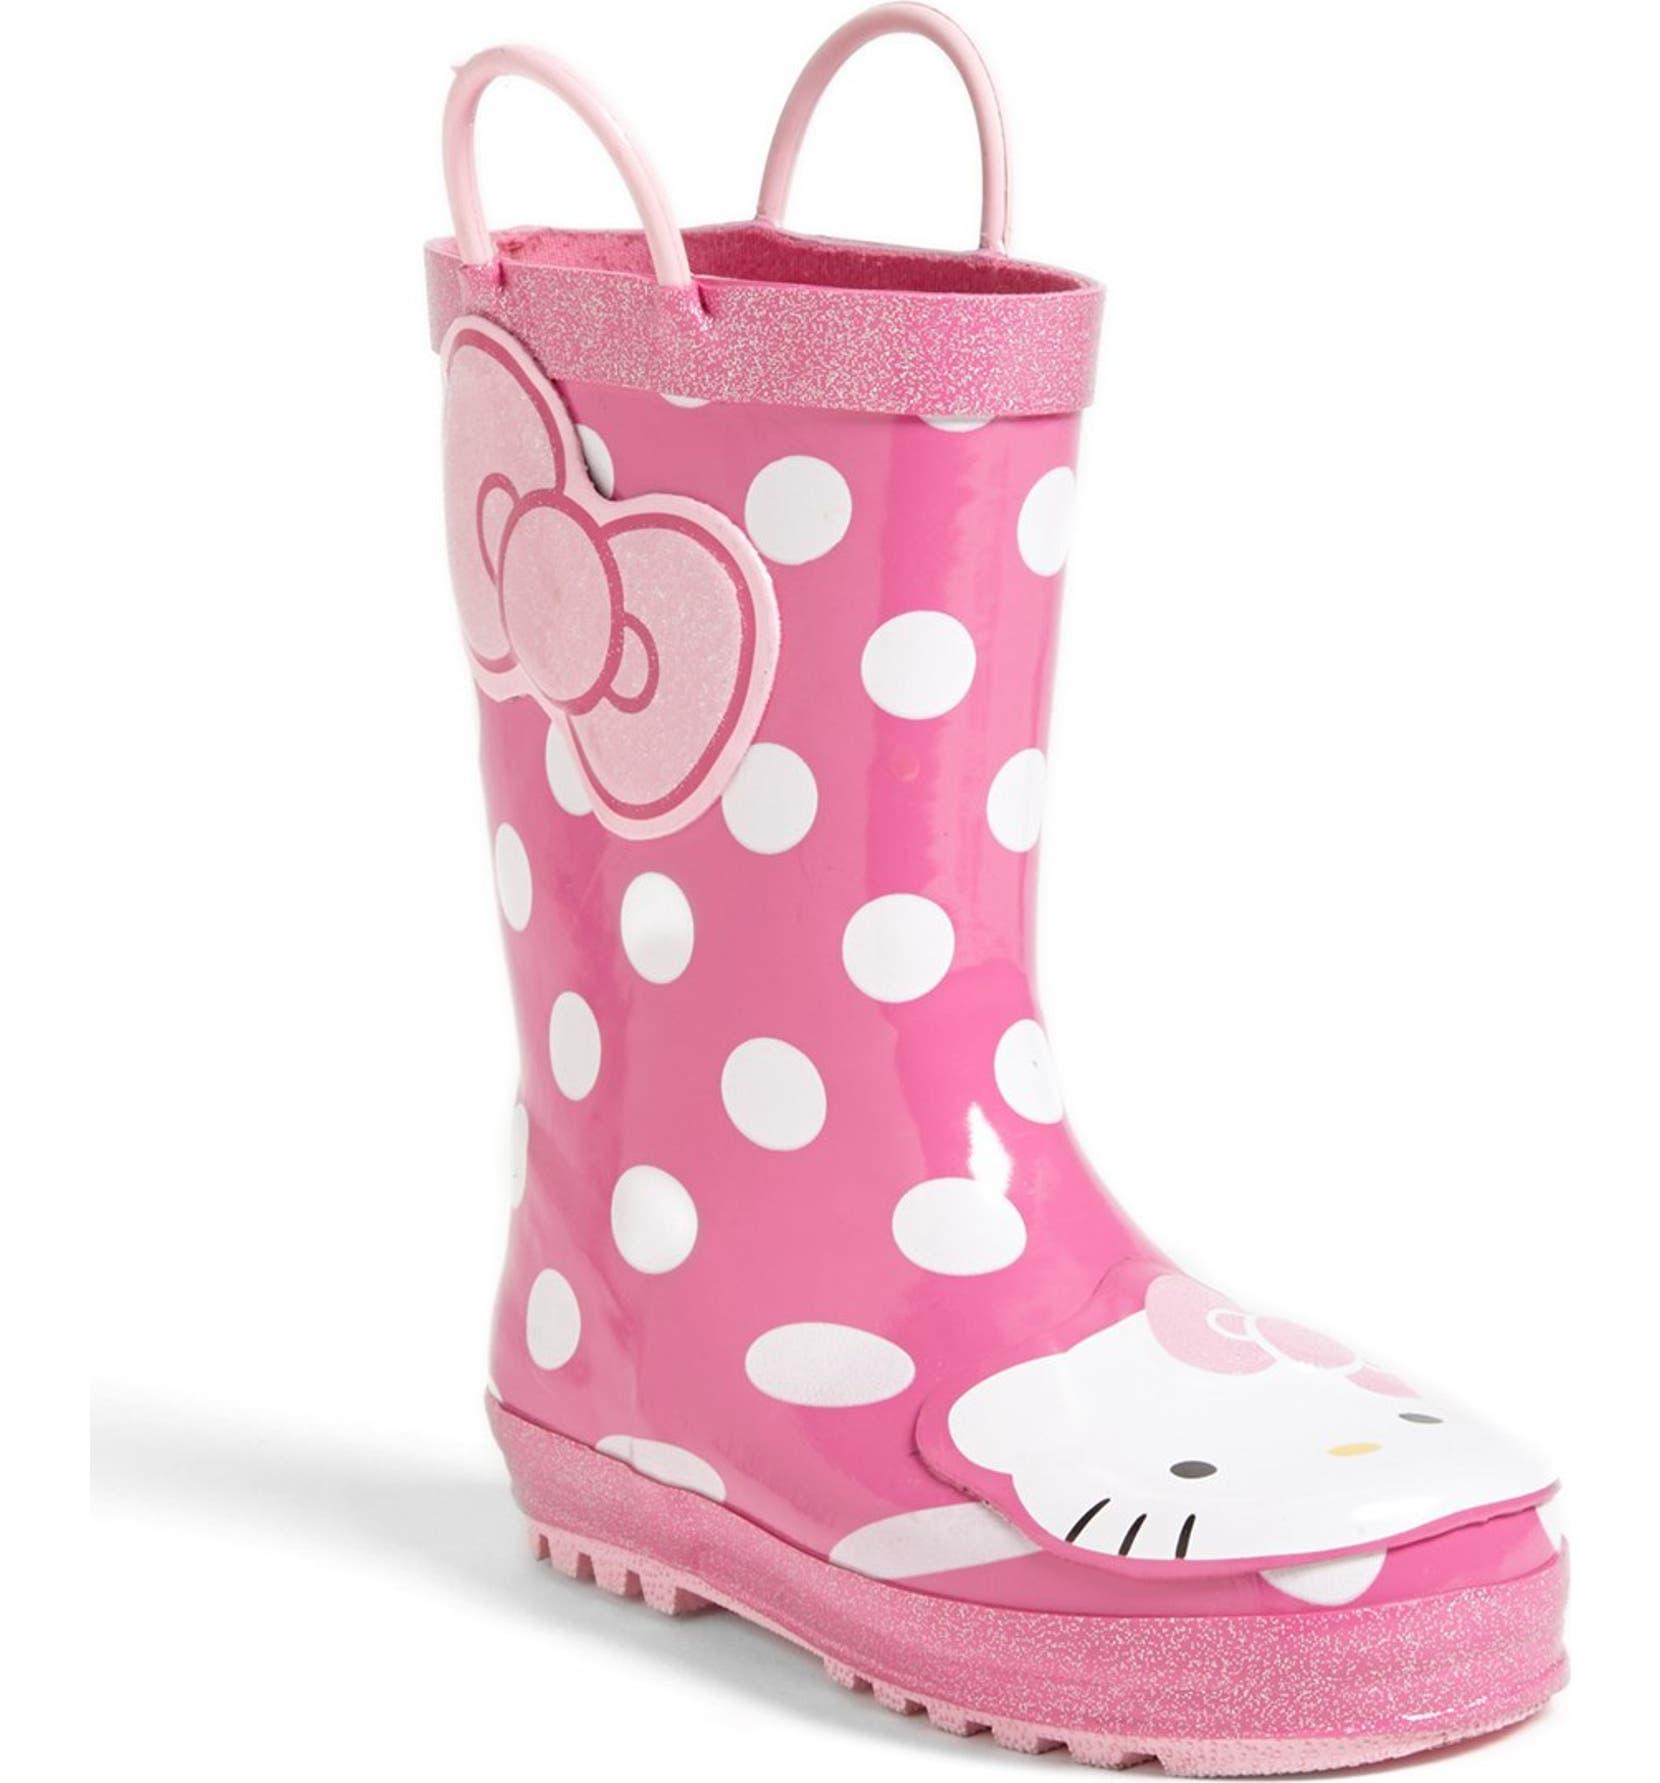 cde2bfb4d Western Chief Hello Kitty® - Cutie Dot Waterproof Rain Boot (Walker,  Toddler, Little Kid & Big Kid) | Nordstrom